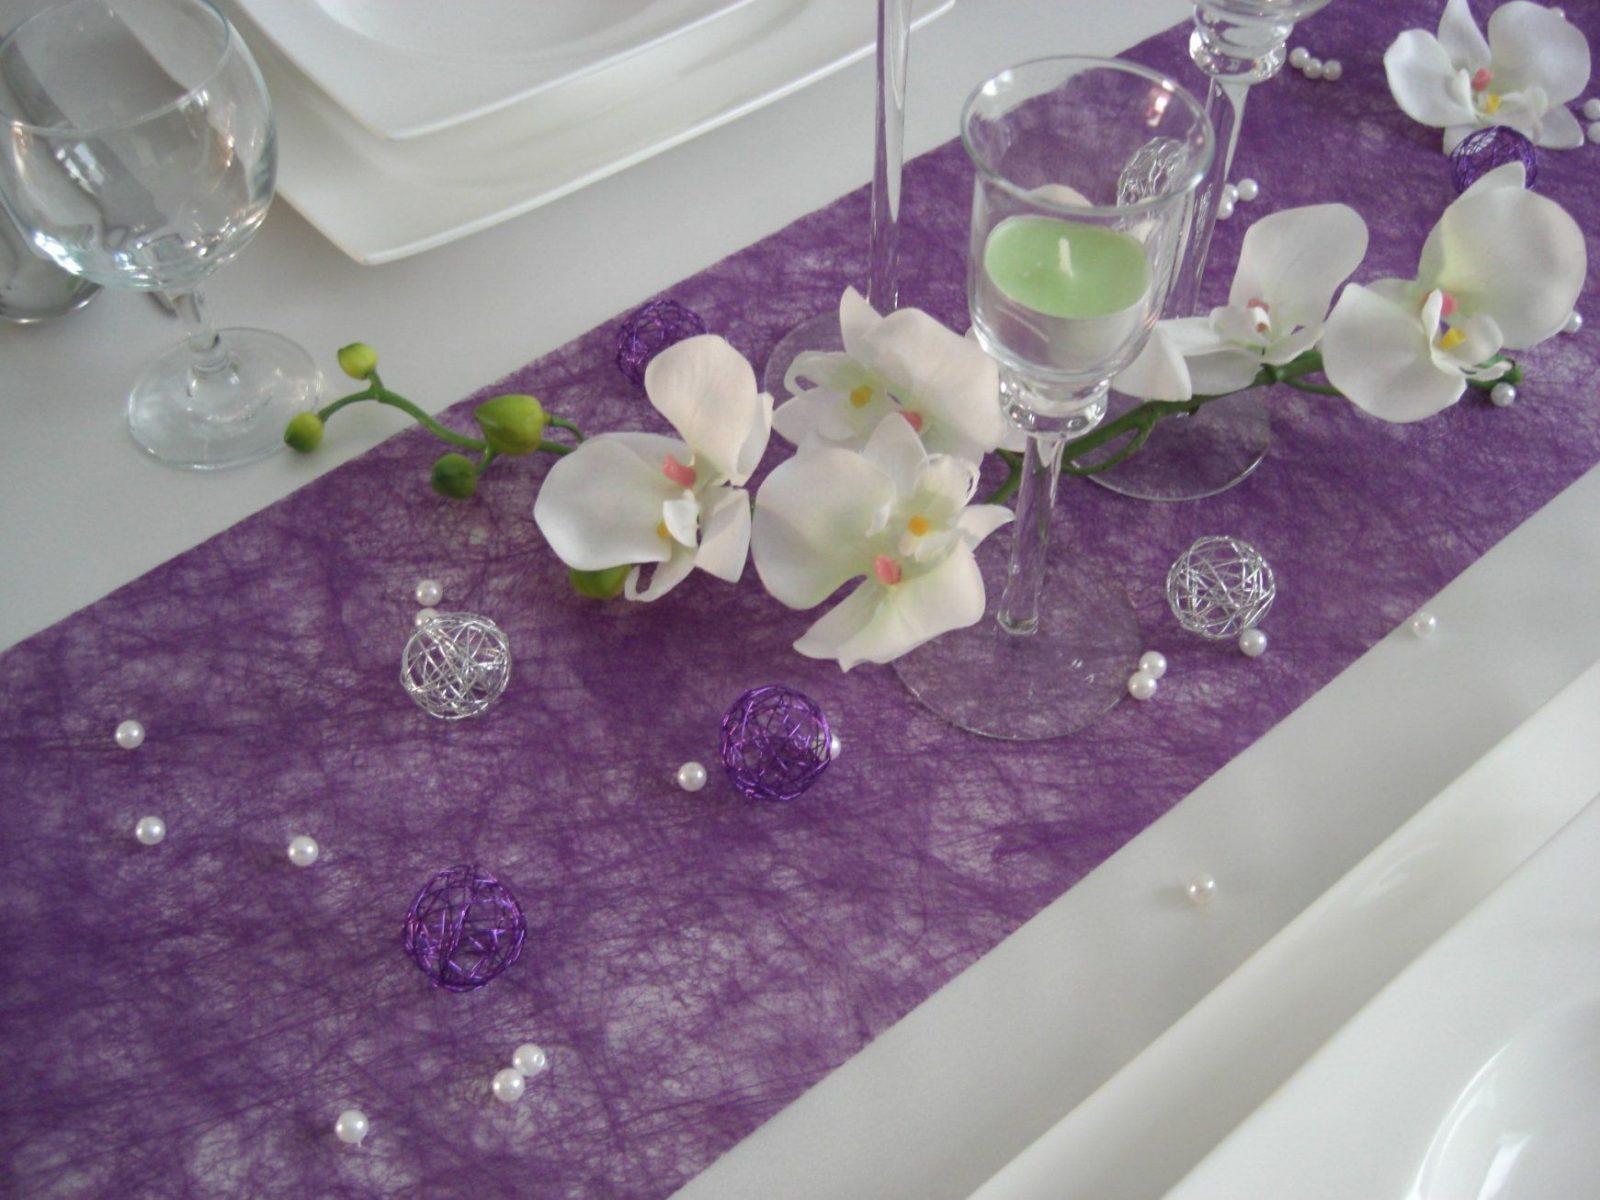 23 Elegant Bewertungen Betreffend Lila Deko Hochzeit  Hochzeit von Tischdeko Hochzeit Lila Weiß Bild